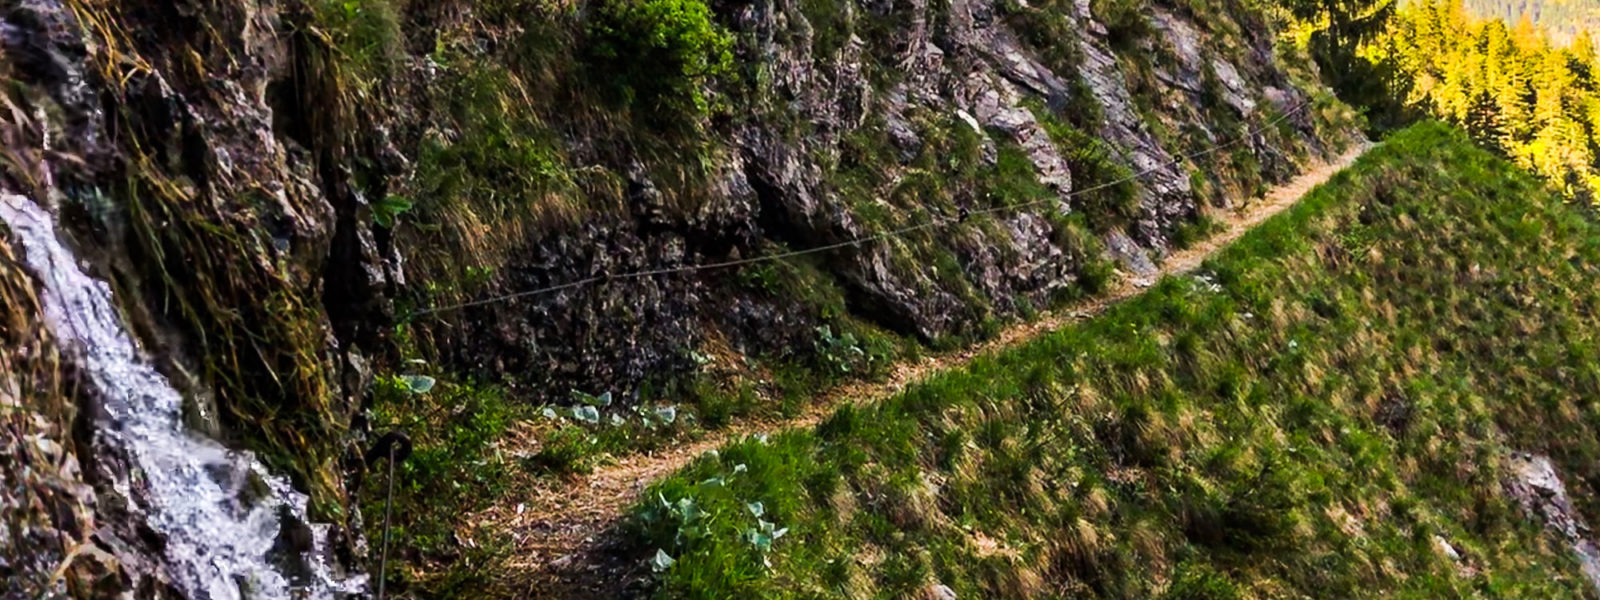 natur-trailrunning-bayern